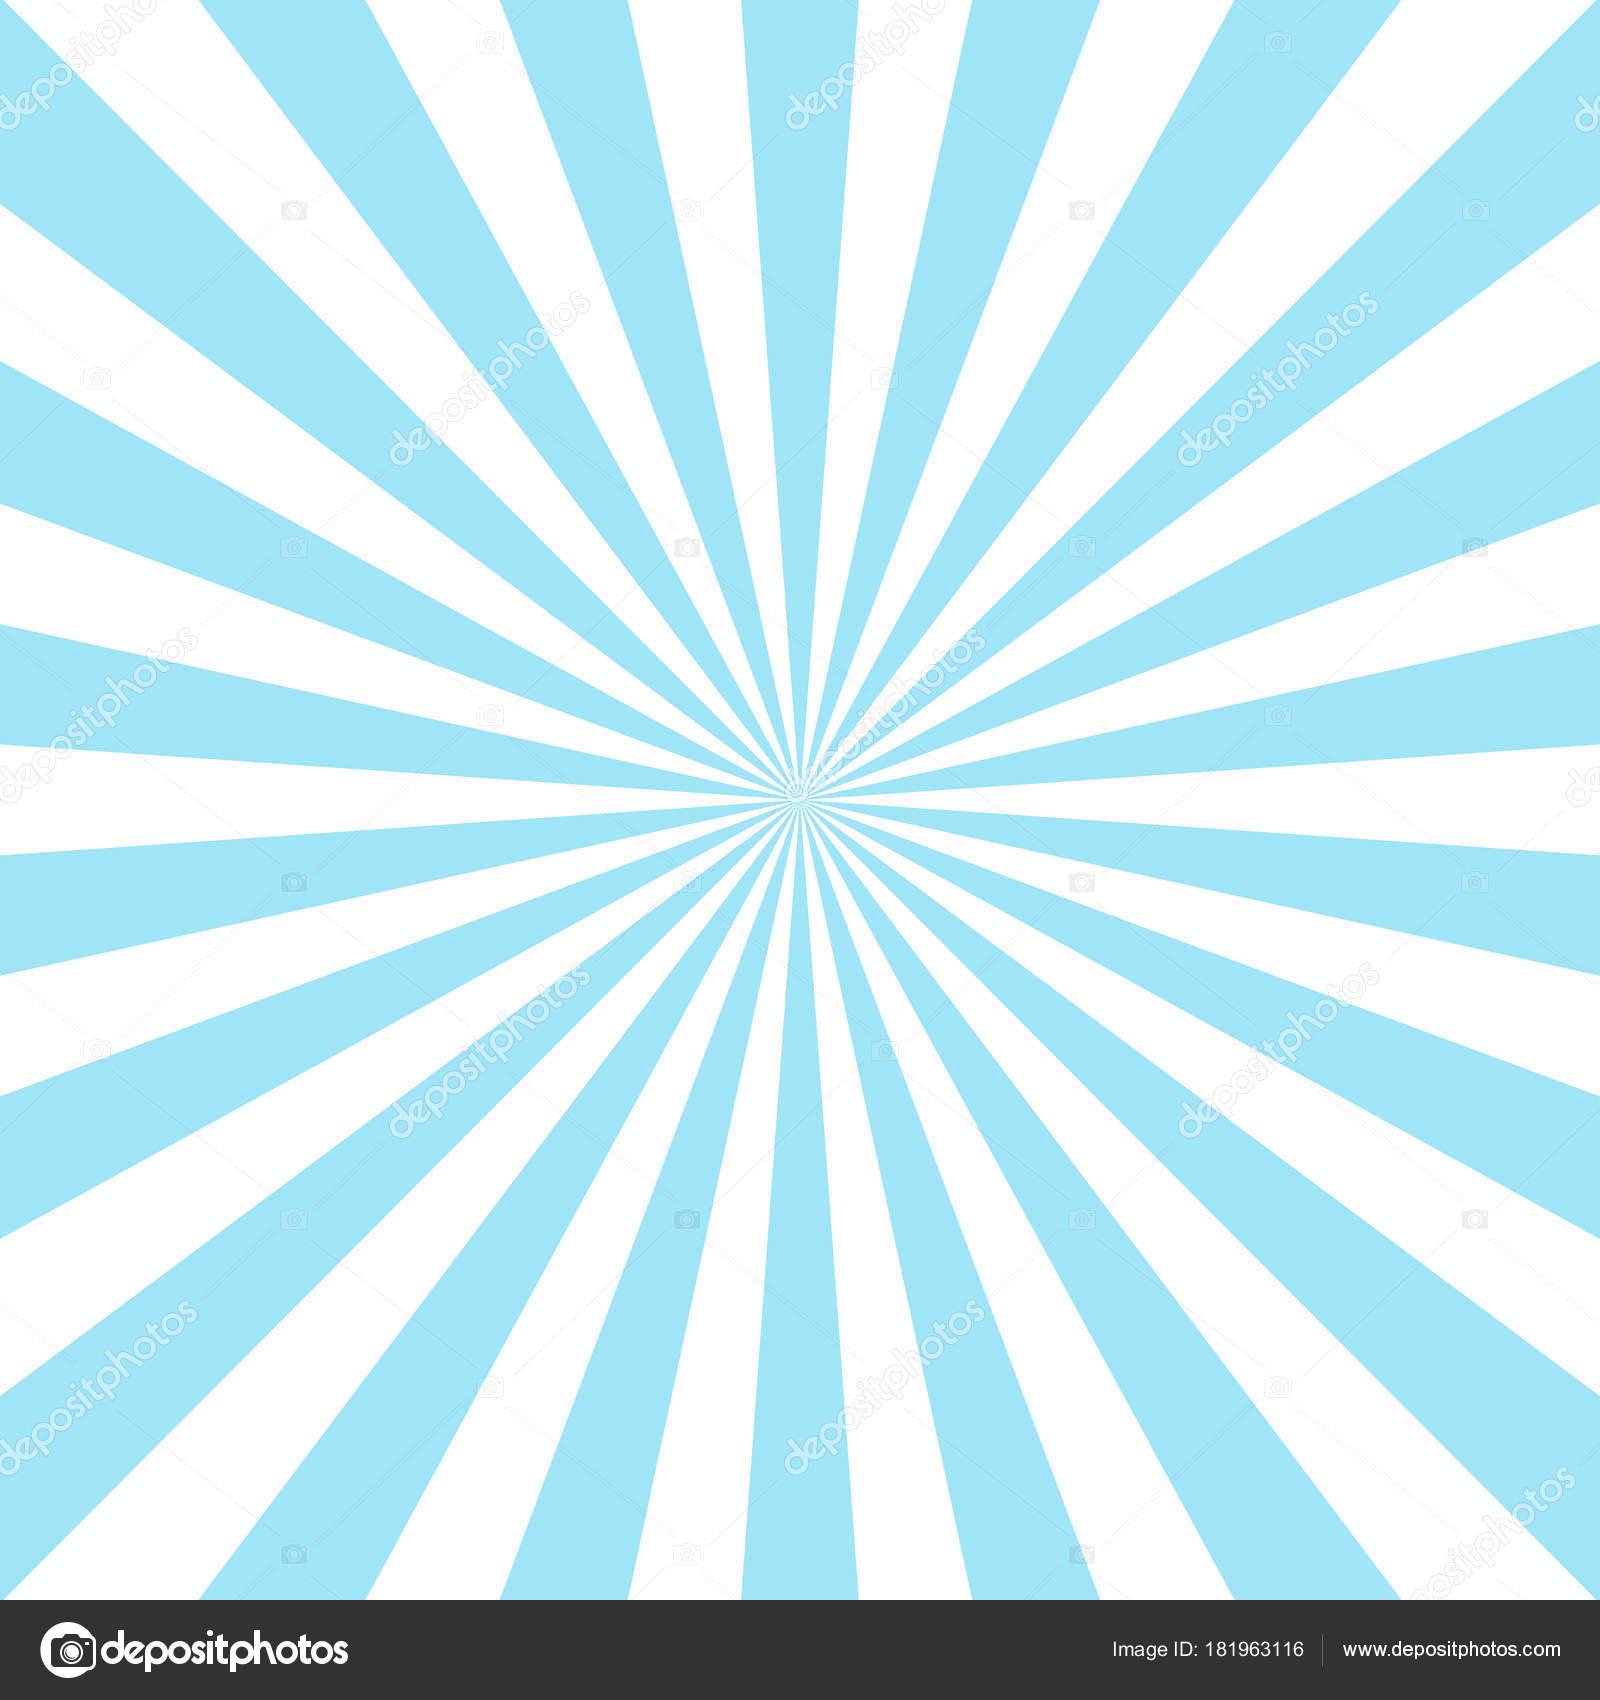 Sunlight Abstract Background Powder Blue And White Color Burst Vector Illustration Sun Beam Ray Sunburst Pattern